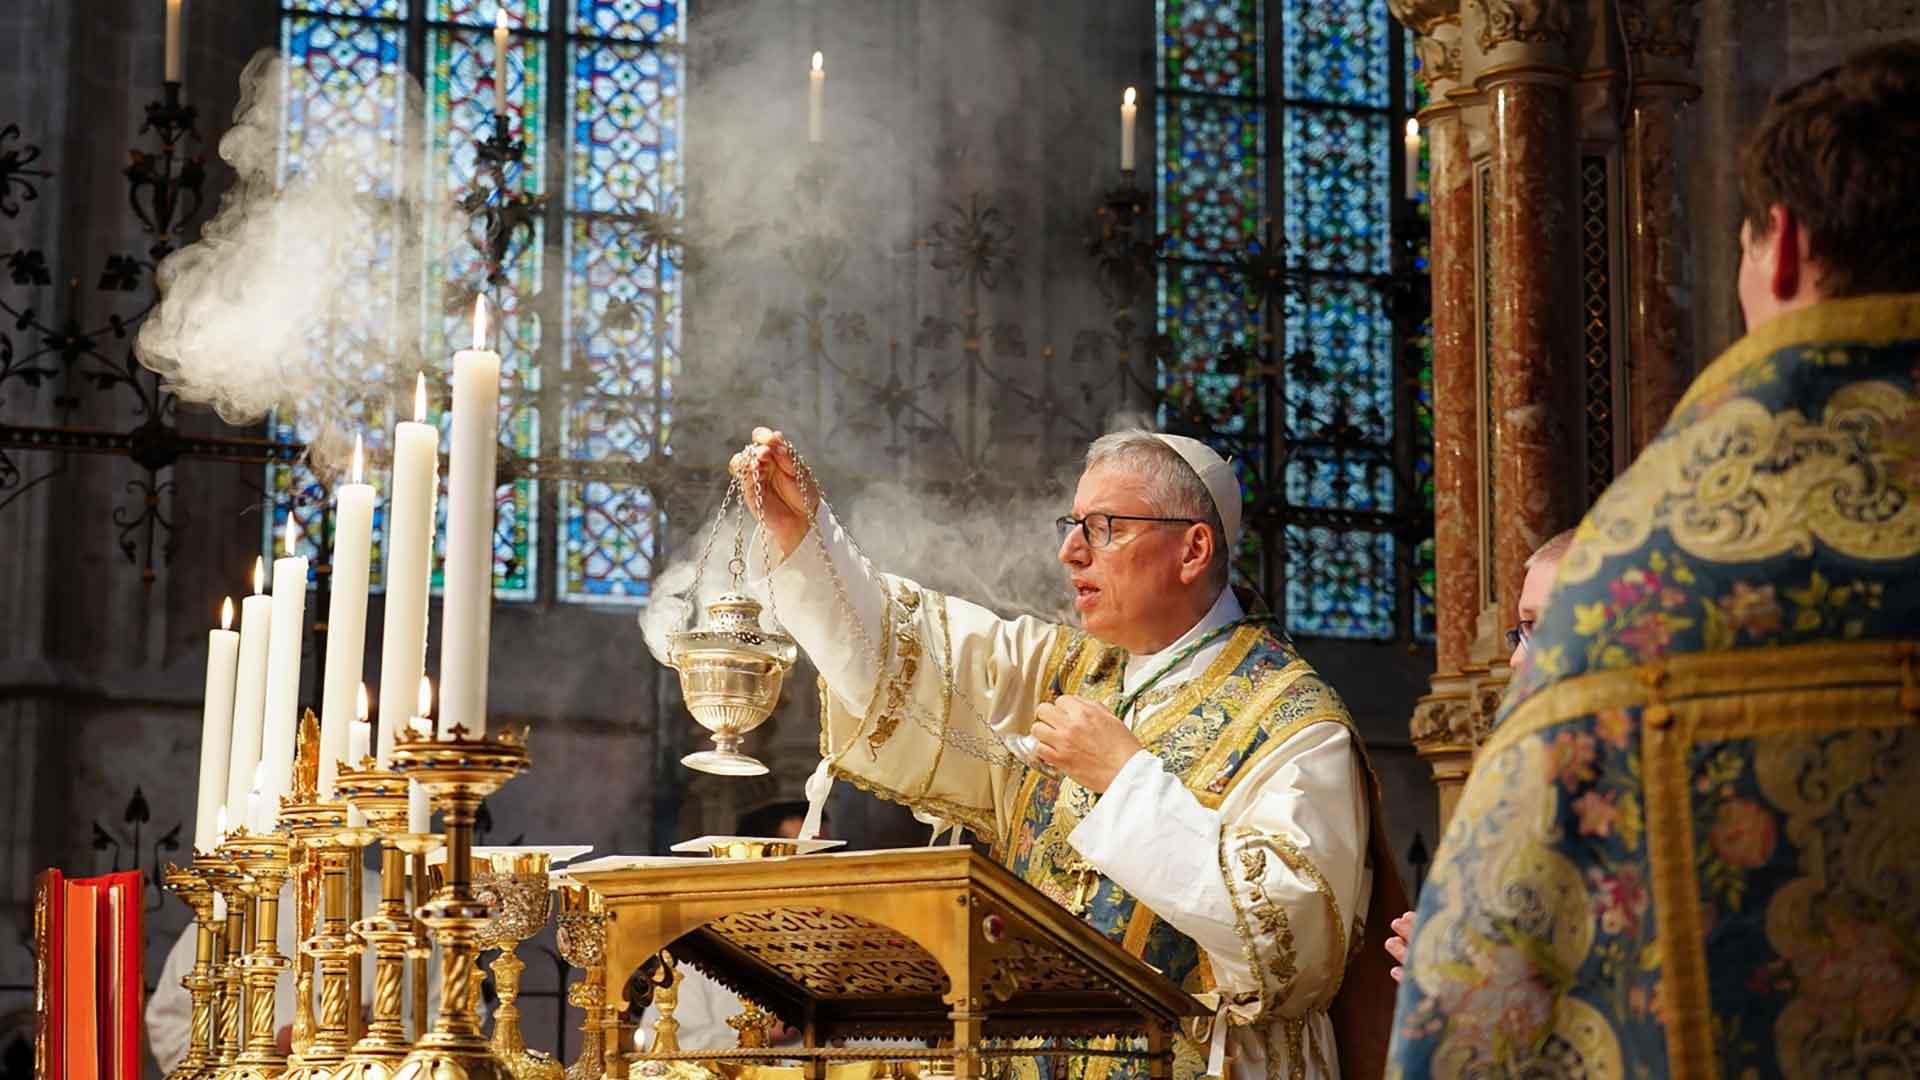 Heilige Messe am 25. April aus dem Stift Heiligenkreuz